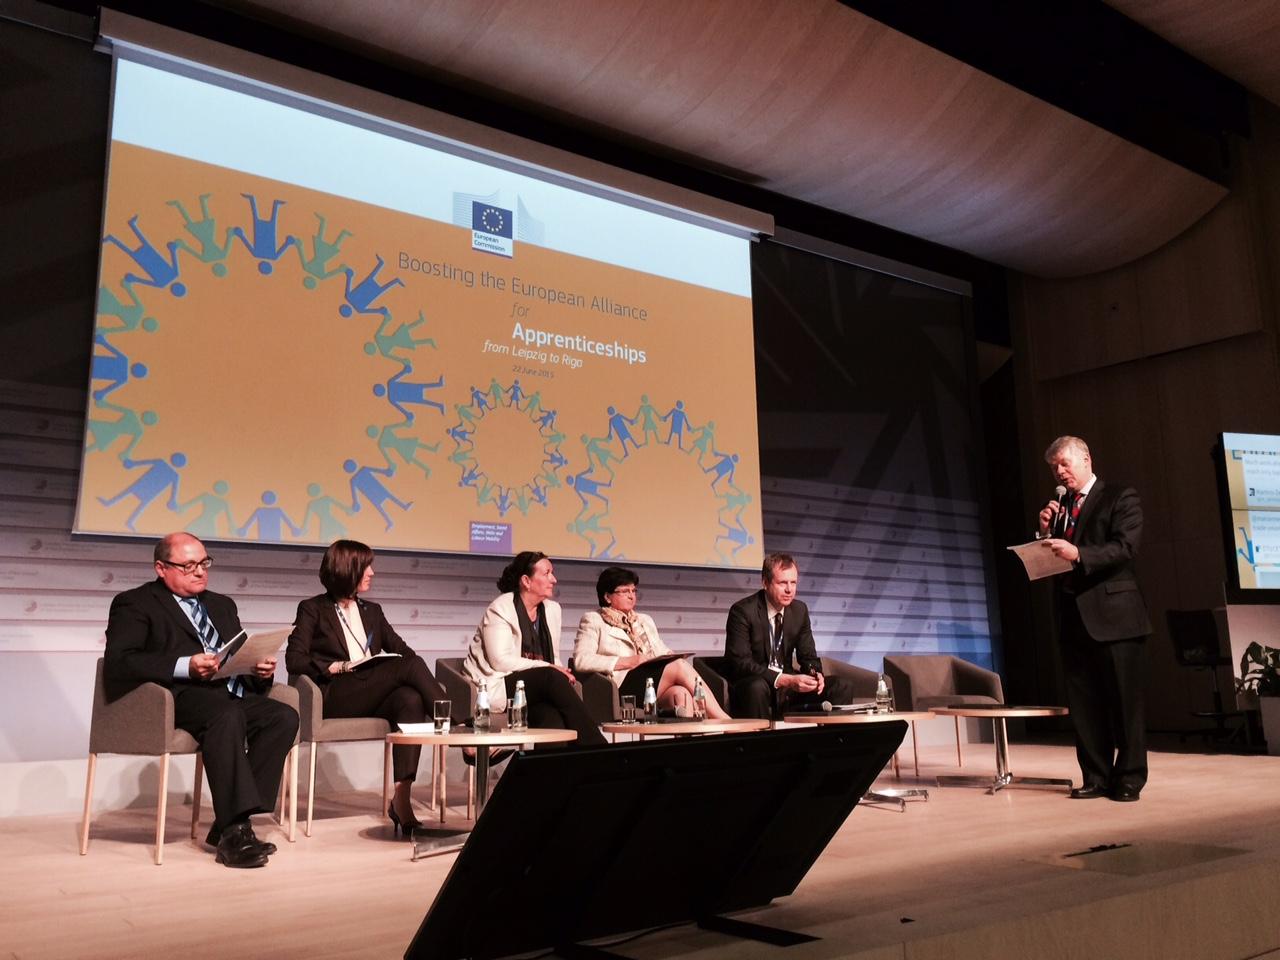 Mr Calleja (left) at the panel discussing apprenticeships